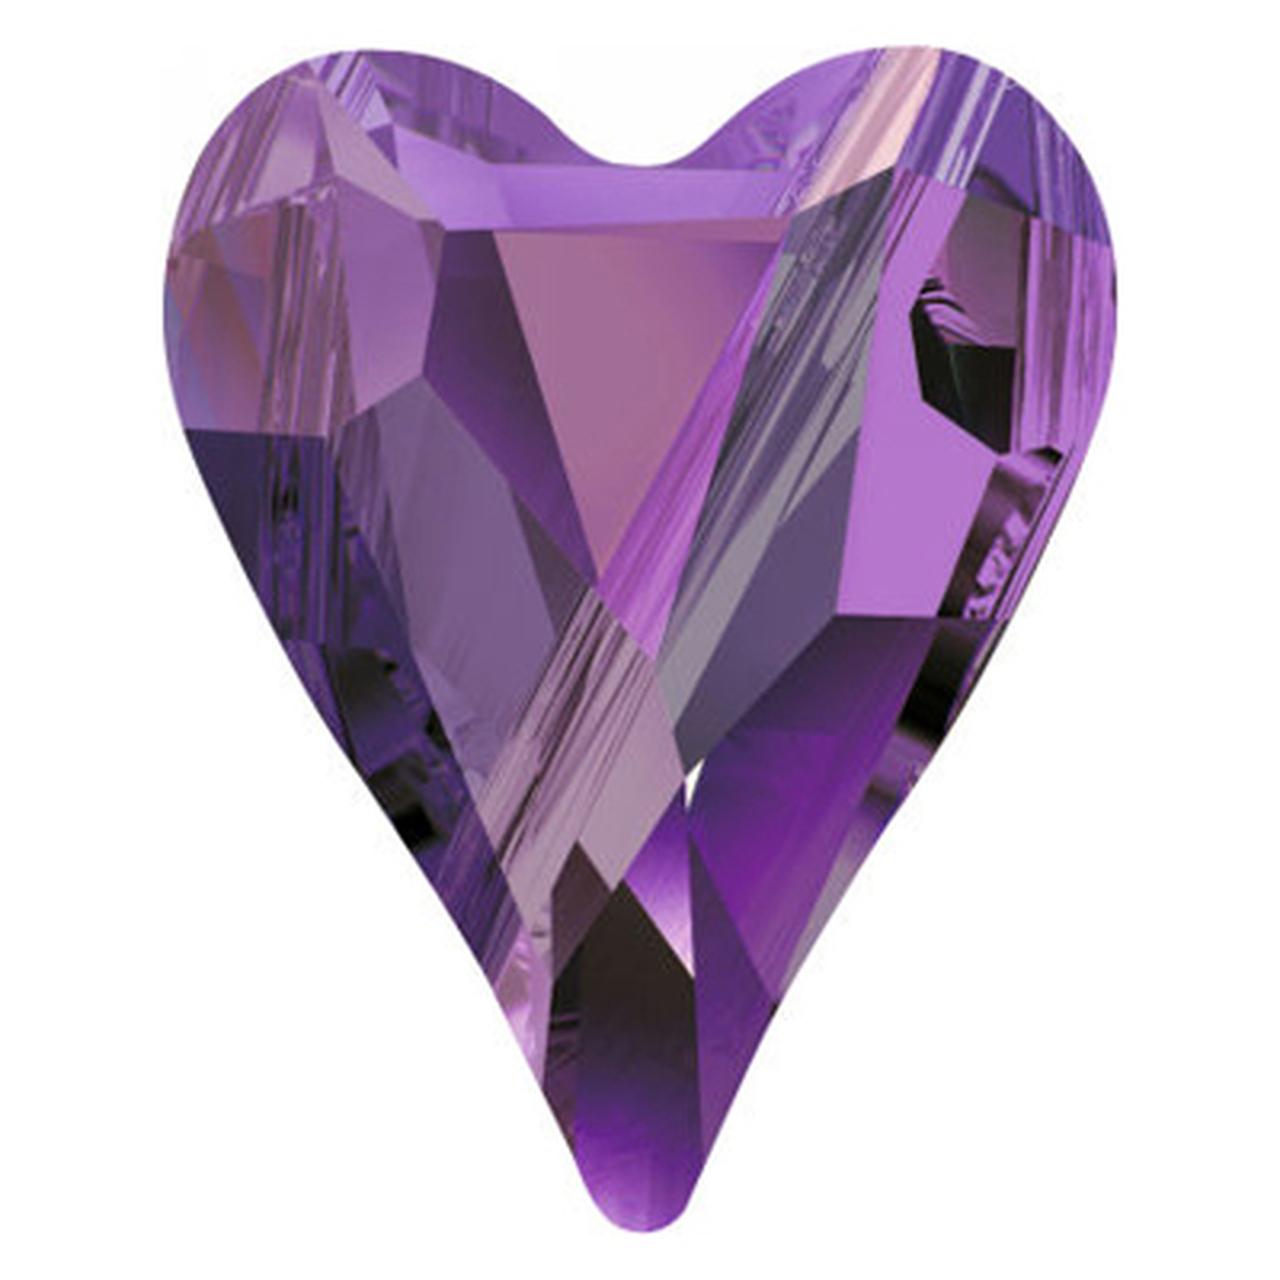 amethyst-heart-beads.jpg